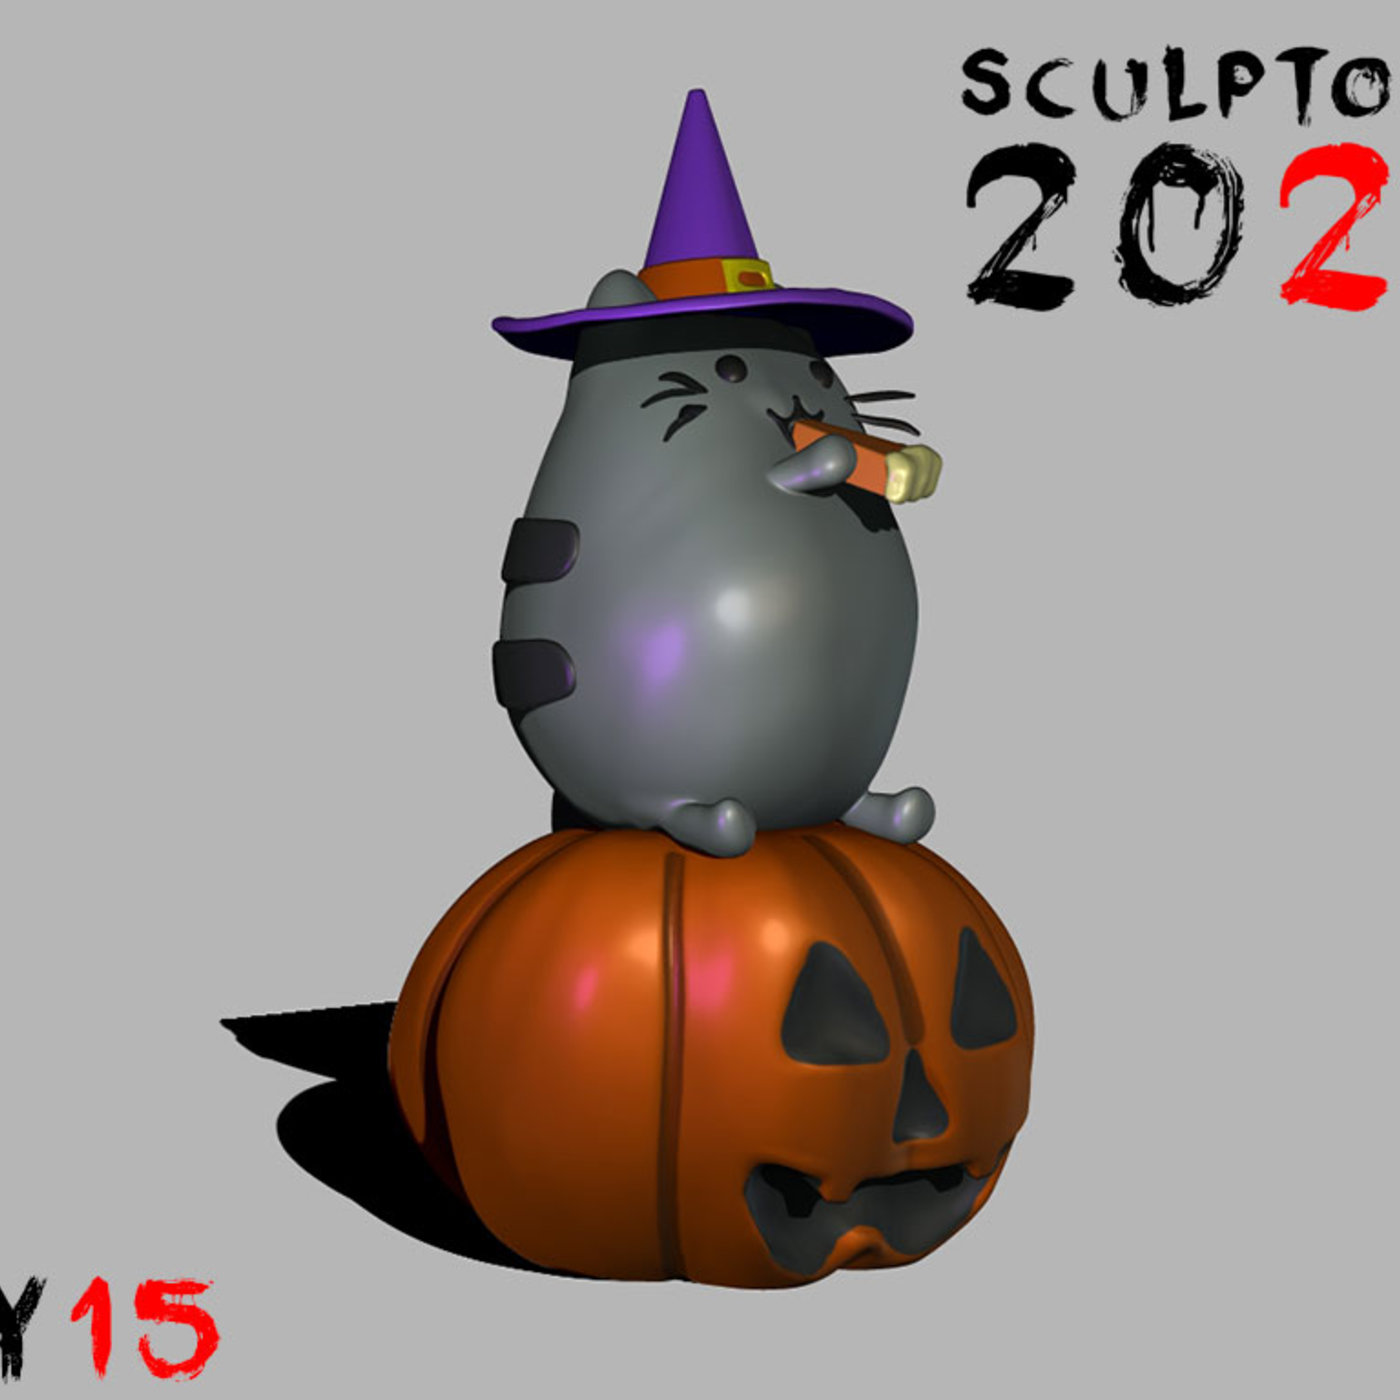 Sculptober DAY 15 Pusheen Cat